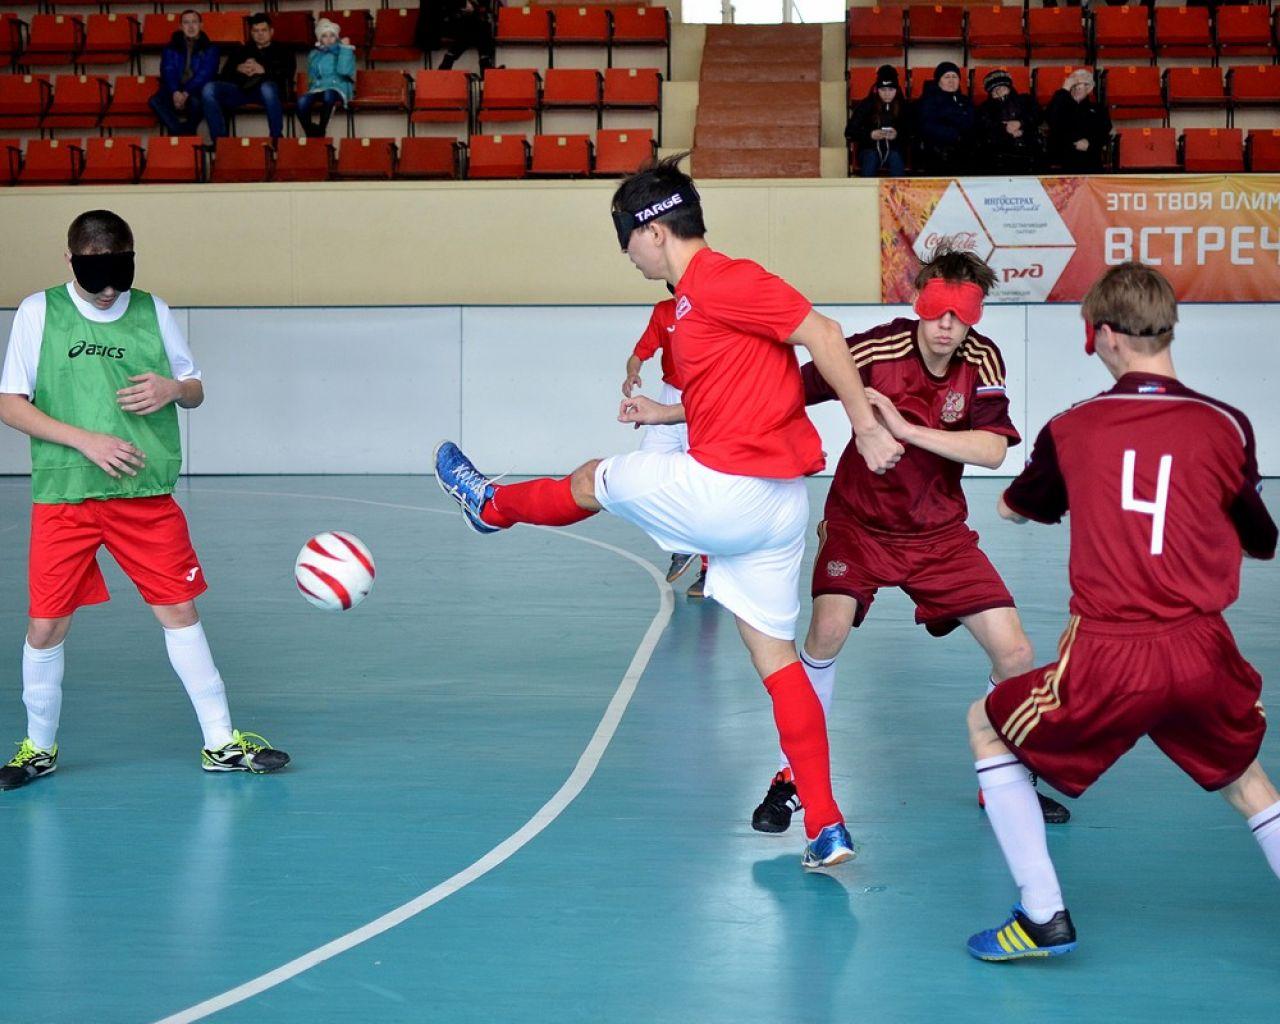 Мини-футбол - Центр спортивной подготовки Республики Татарстан